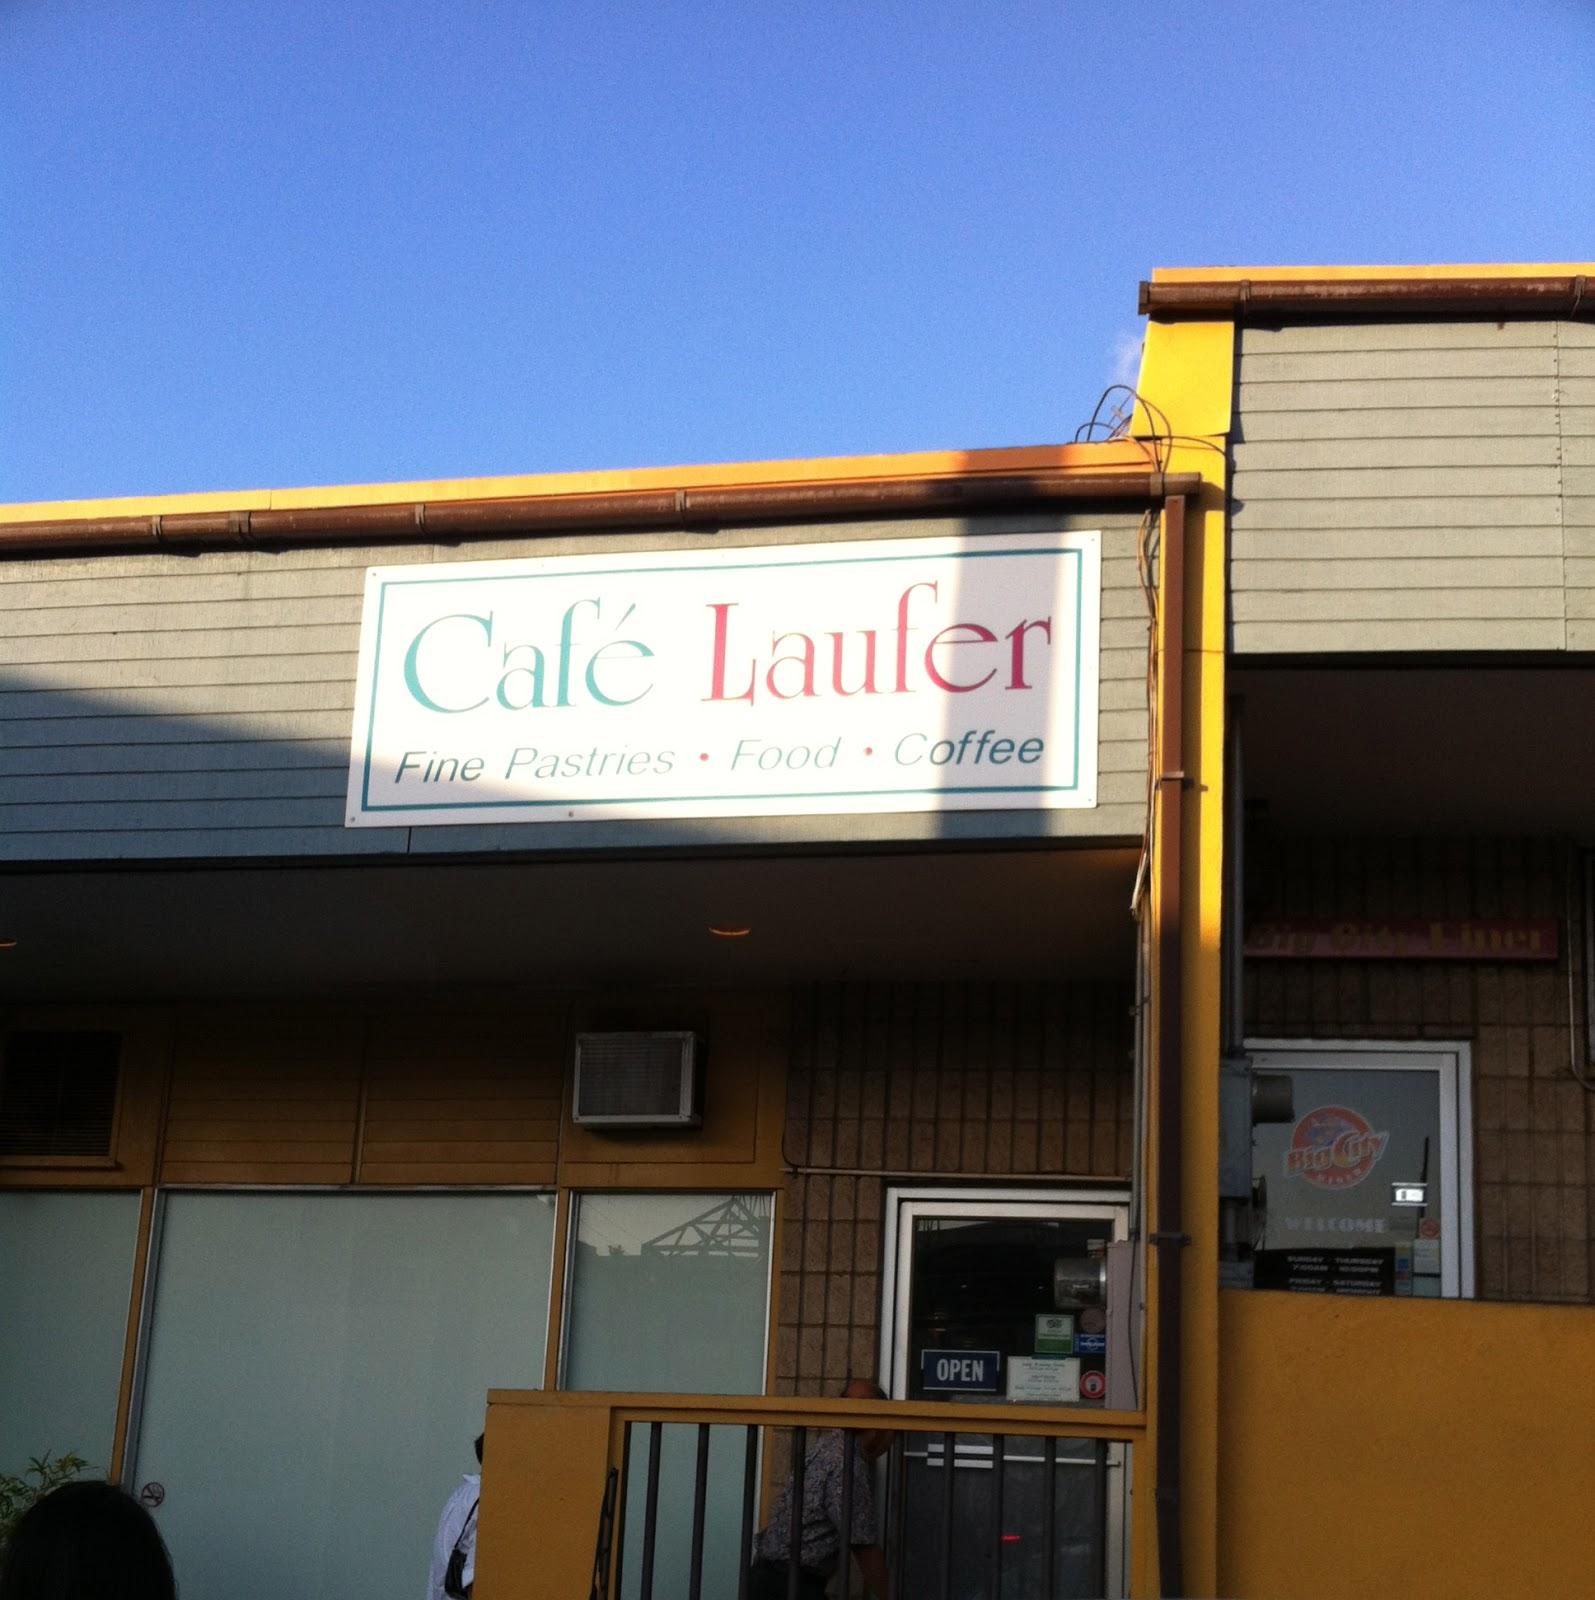 Laufer: TASTE OF HAWAII: CAFE LAUFER